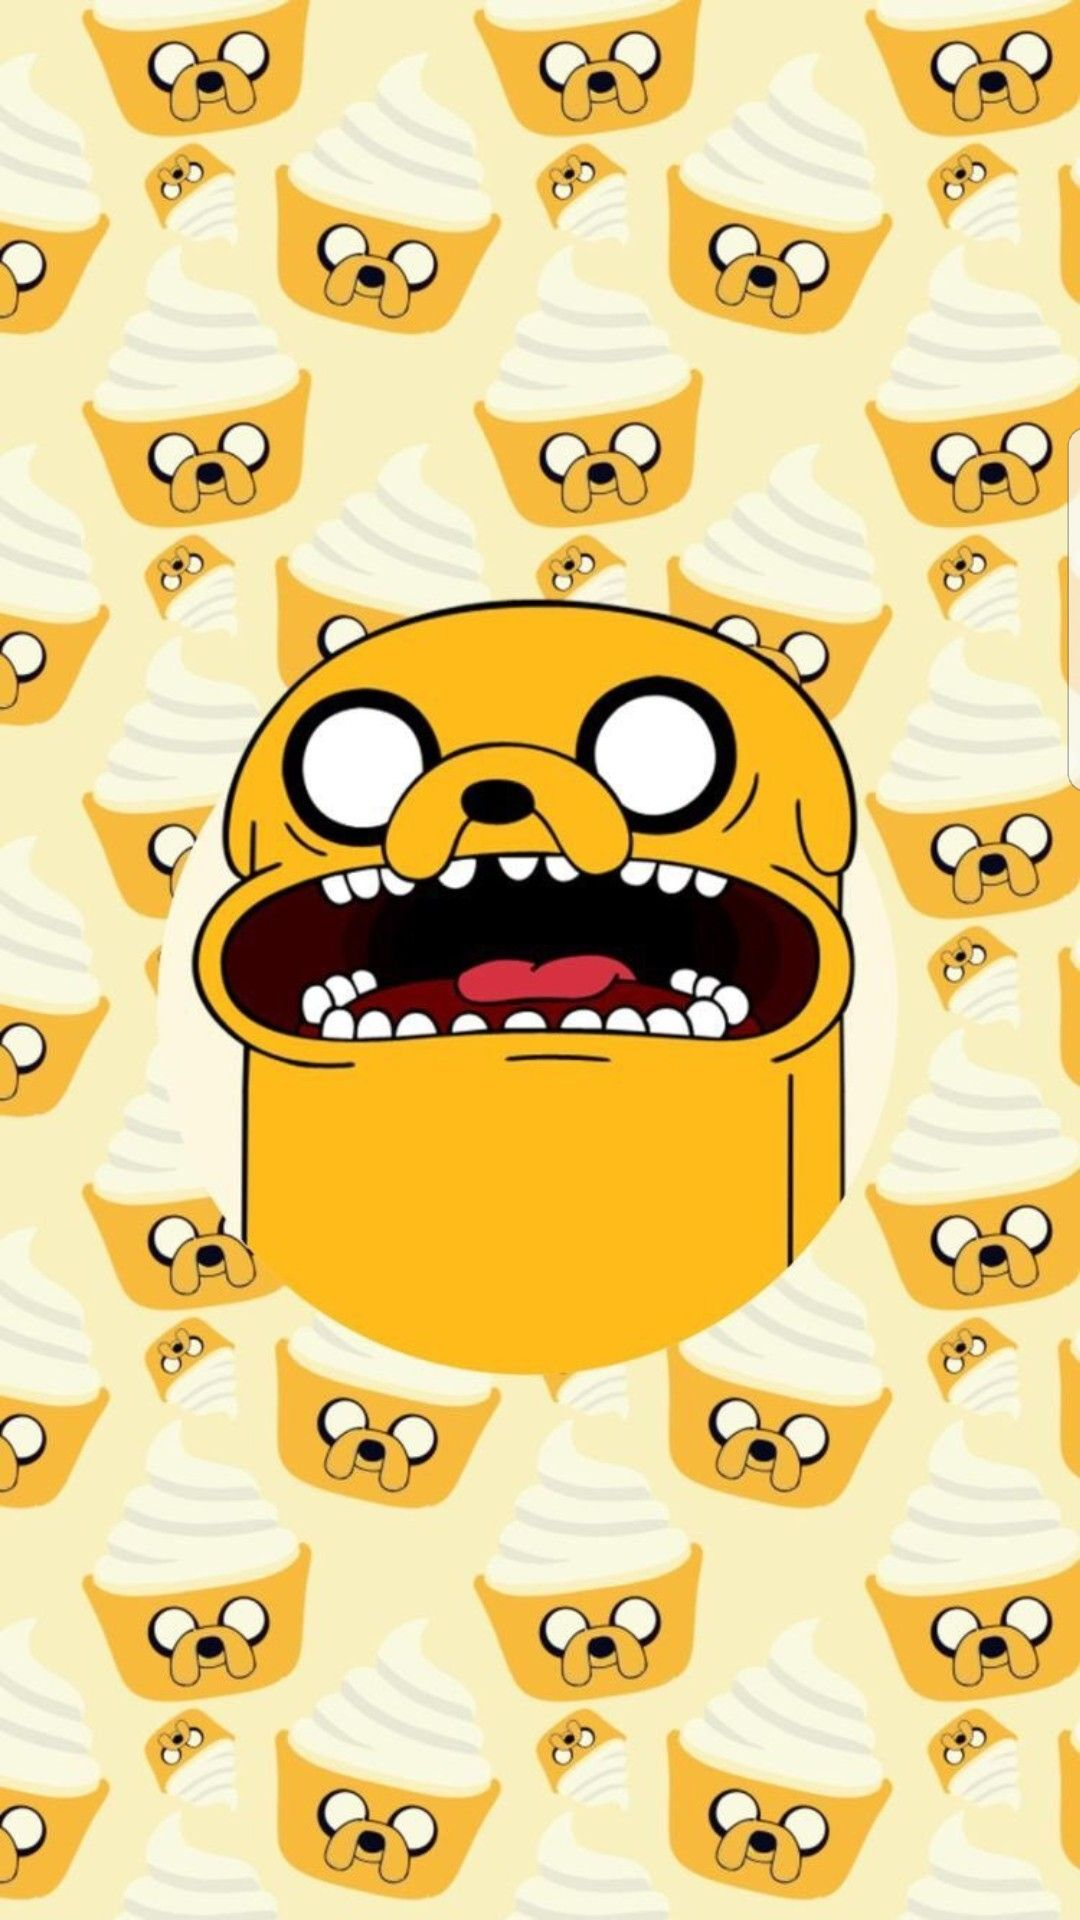 Pinterest Mbetulduru Wallpaper Jack The Dog Adventure Time Yellow Black White Co Adventure Time Wallpaper Adventure Time Iphone Wallpaper Jake Adventure Time